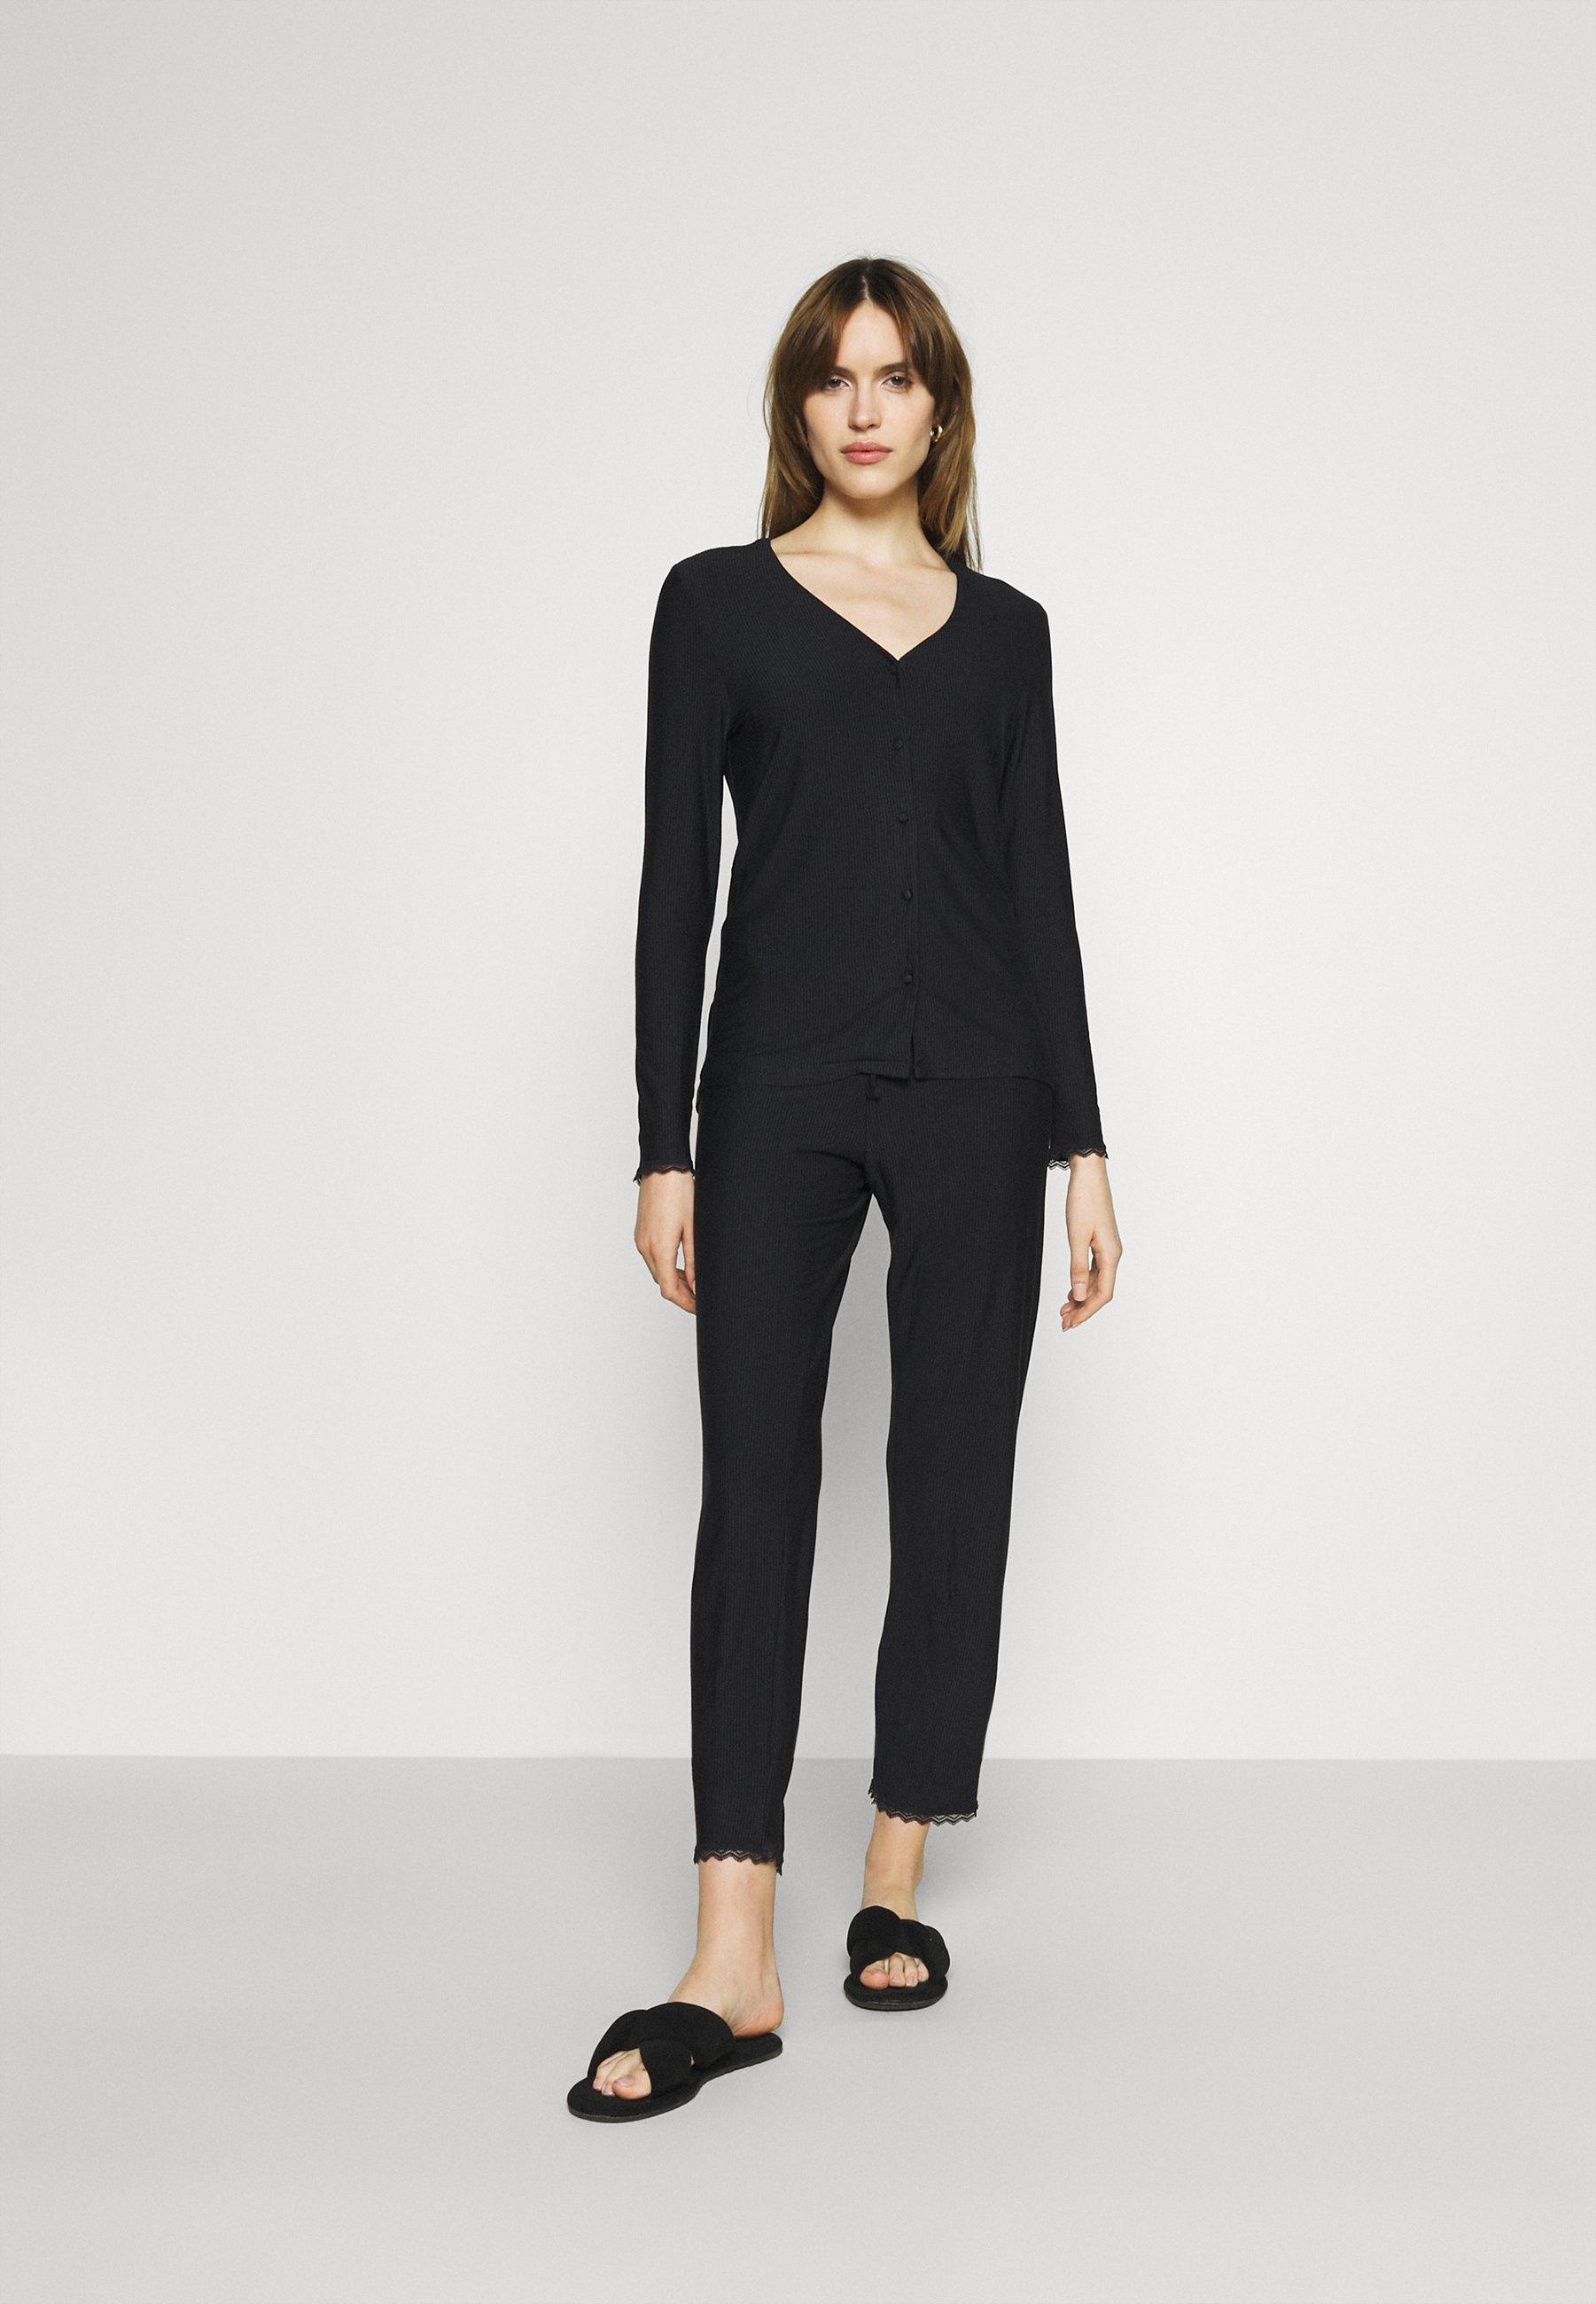 Femme SOFT STRIPES LONGSLEEVE LONG PANTS - Pyjama